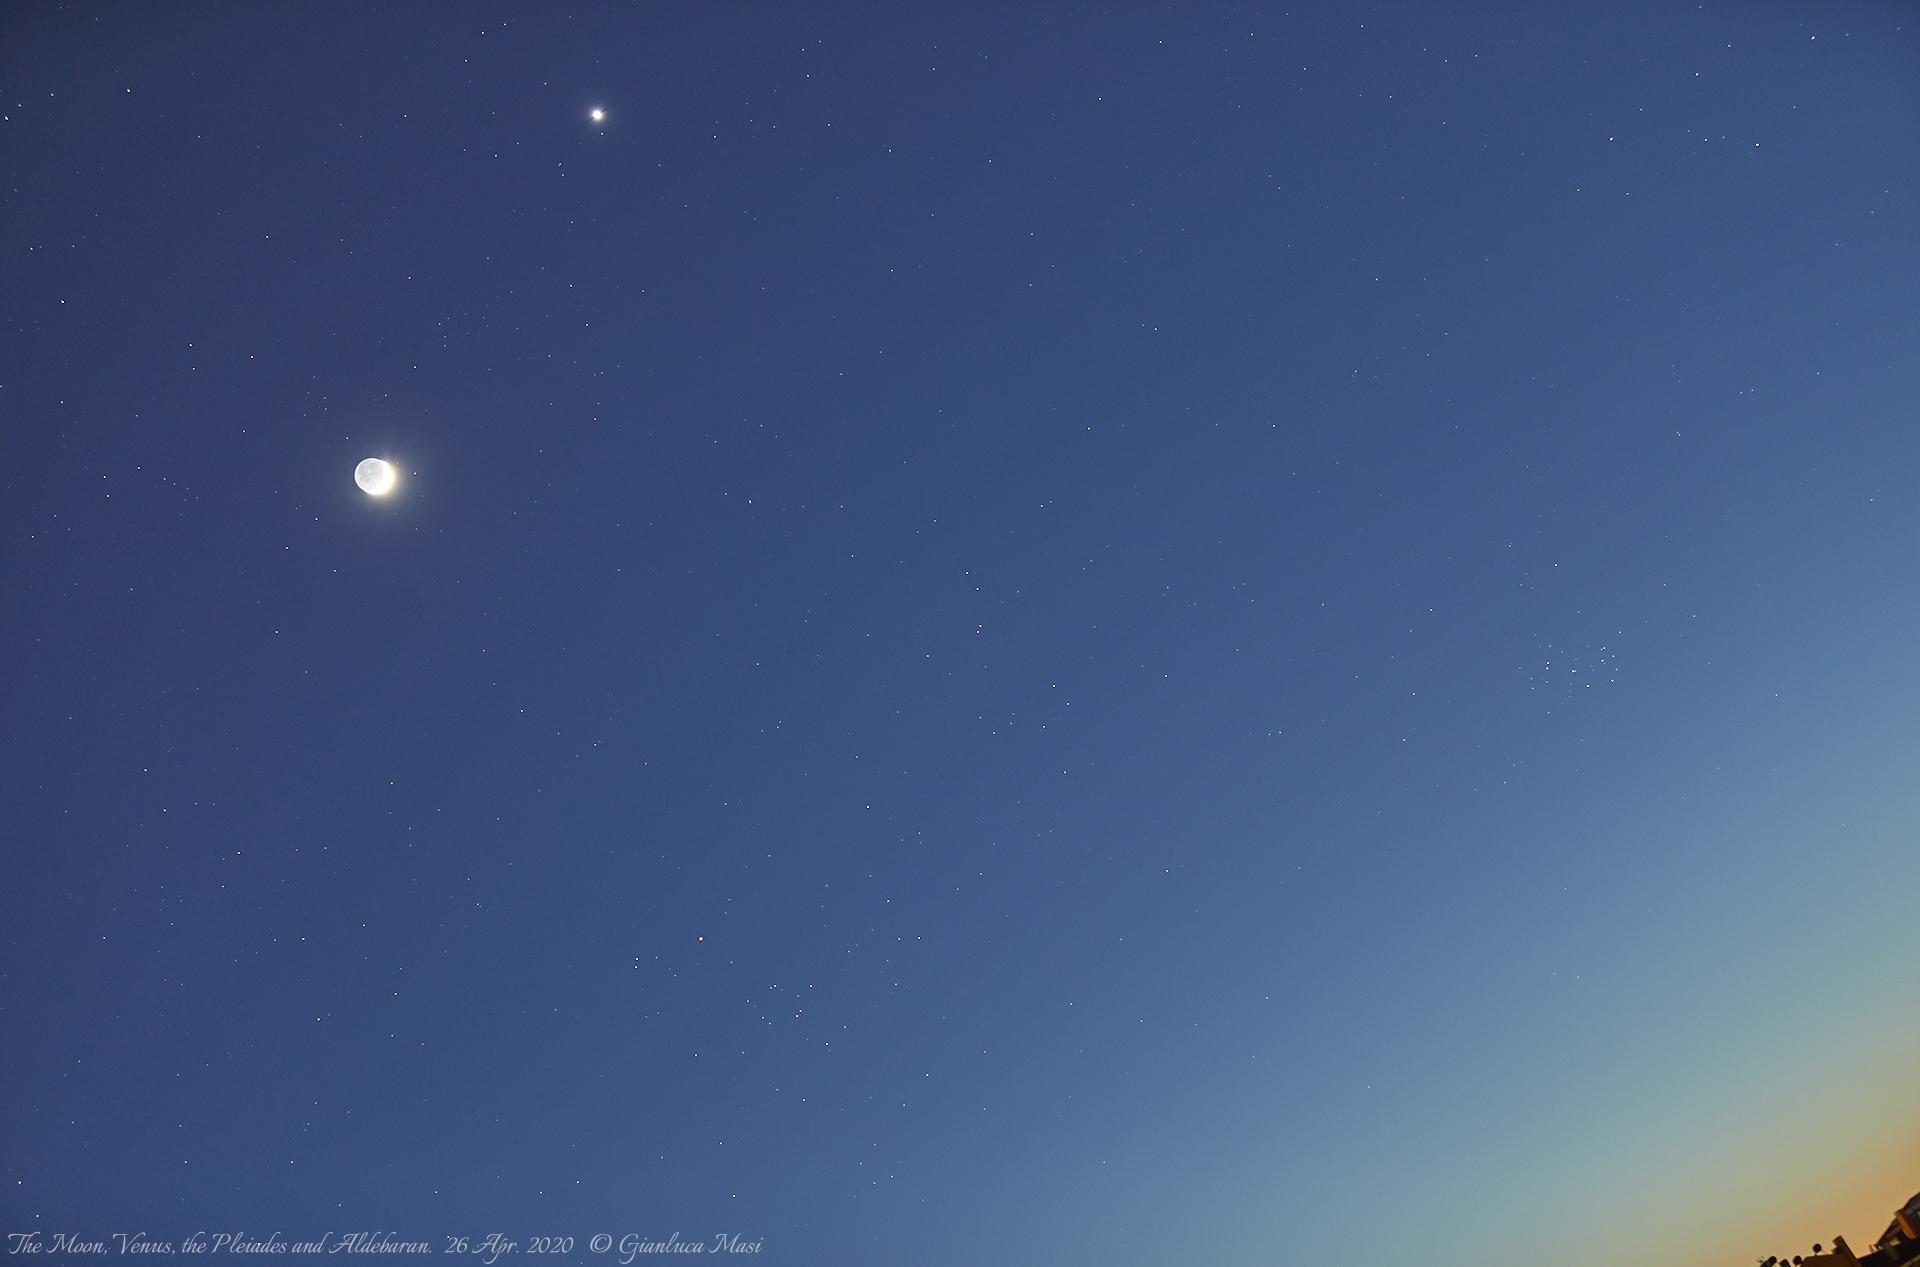 The Moon, Venus, Aldebaran and the Pleiades. 26 Apr. 2020